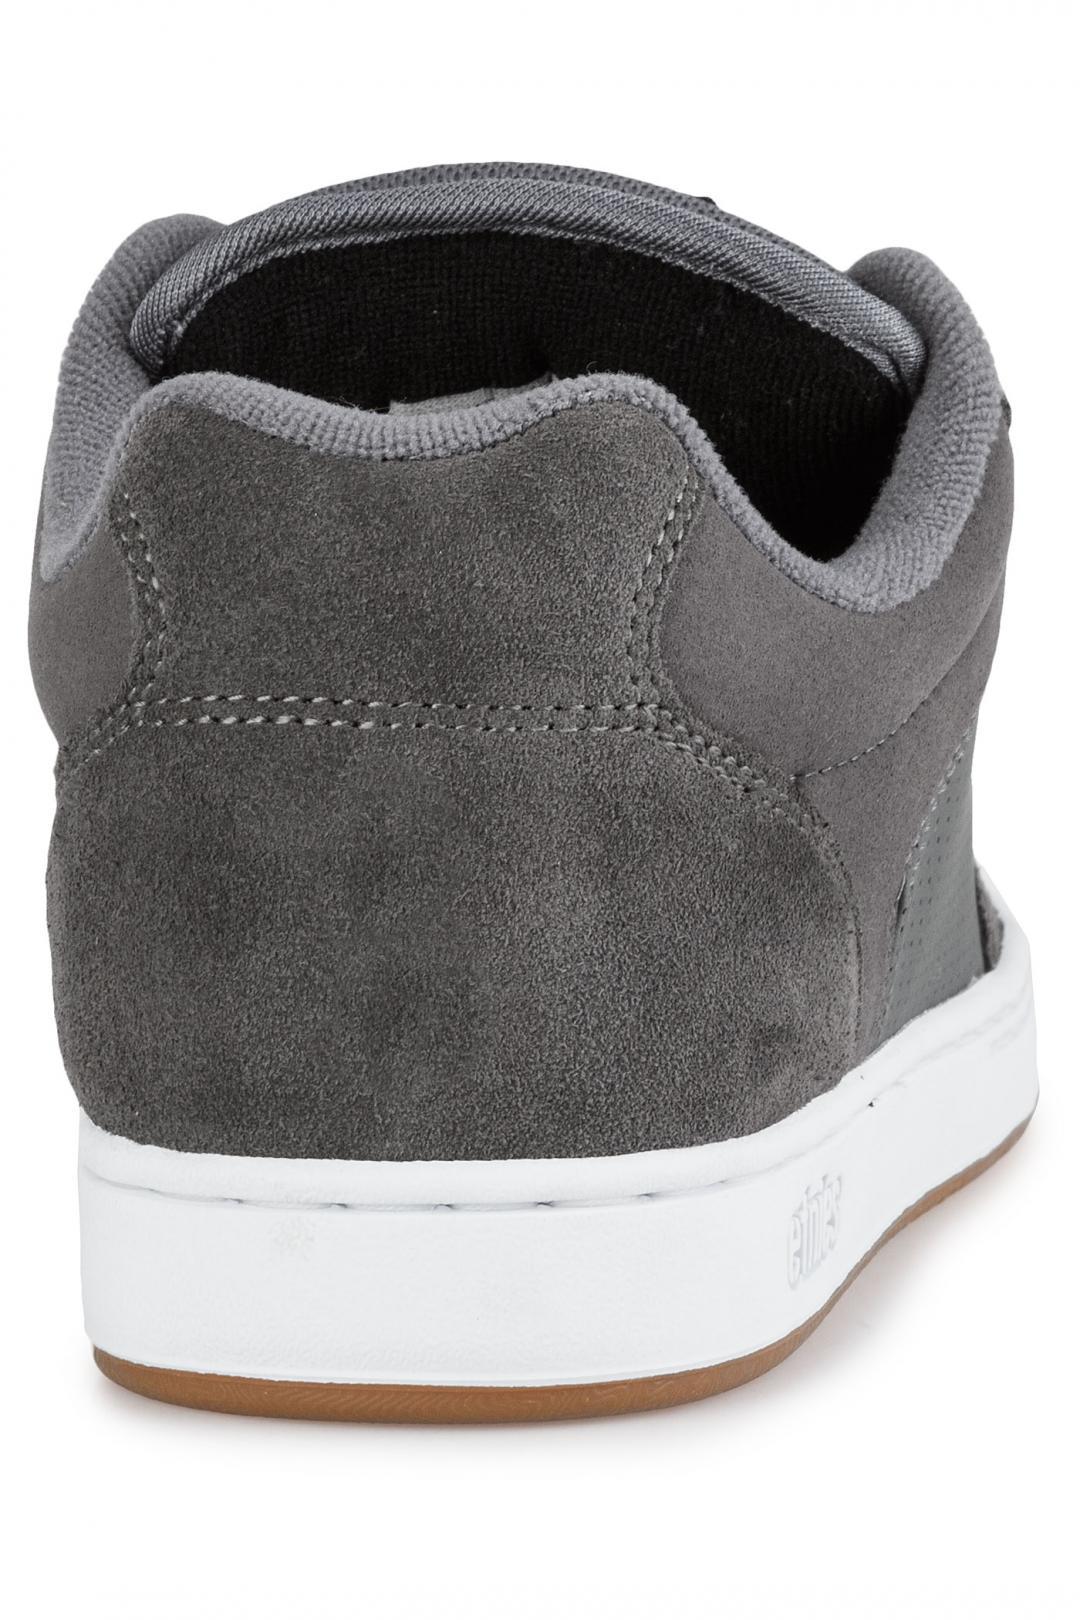 Uomo Etnies Barge XL grey white gum | Sneaker